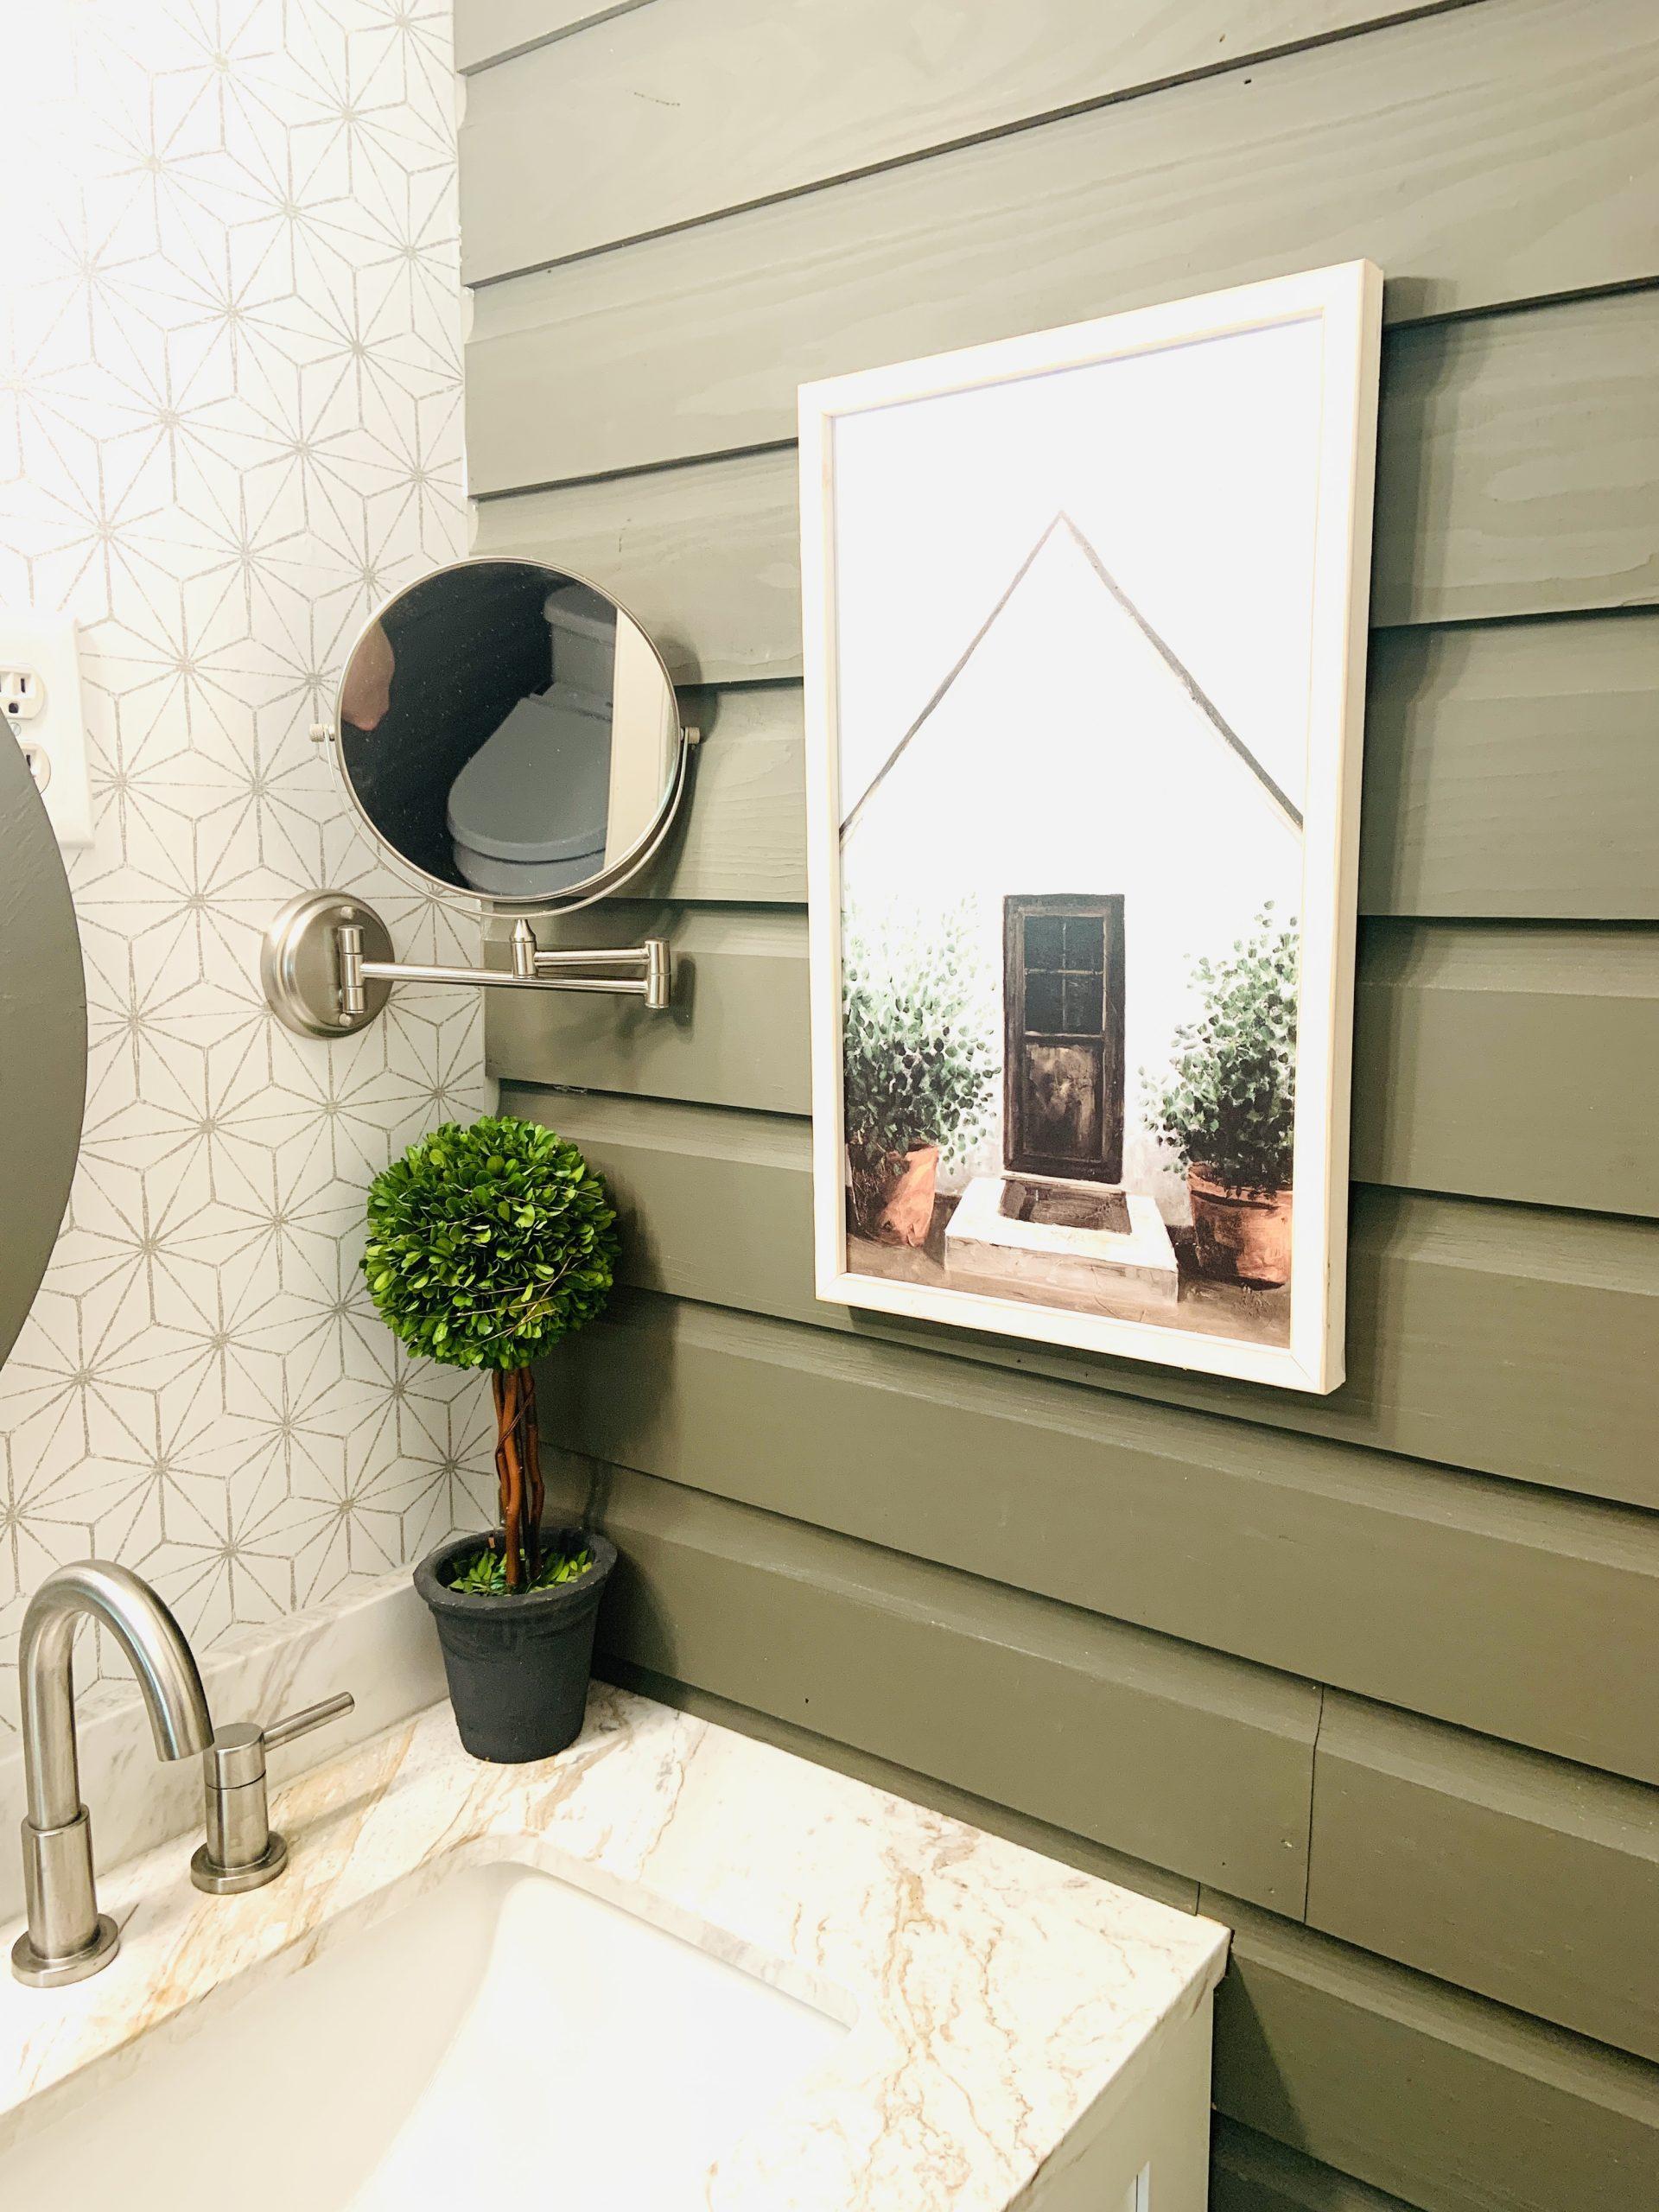 Bathroom mirror and farmhouse style painting